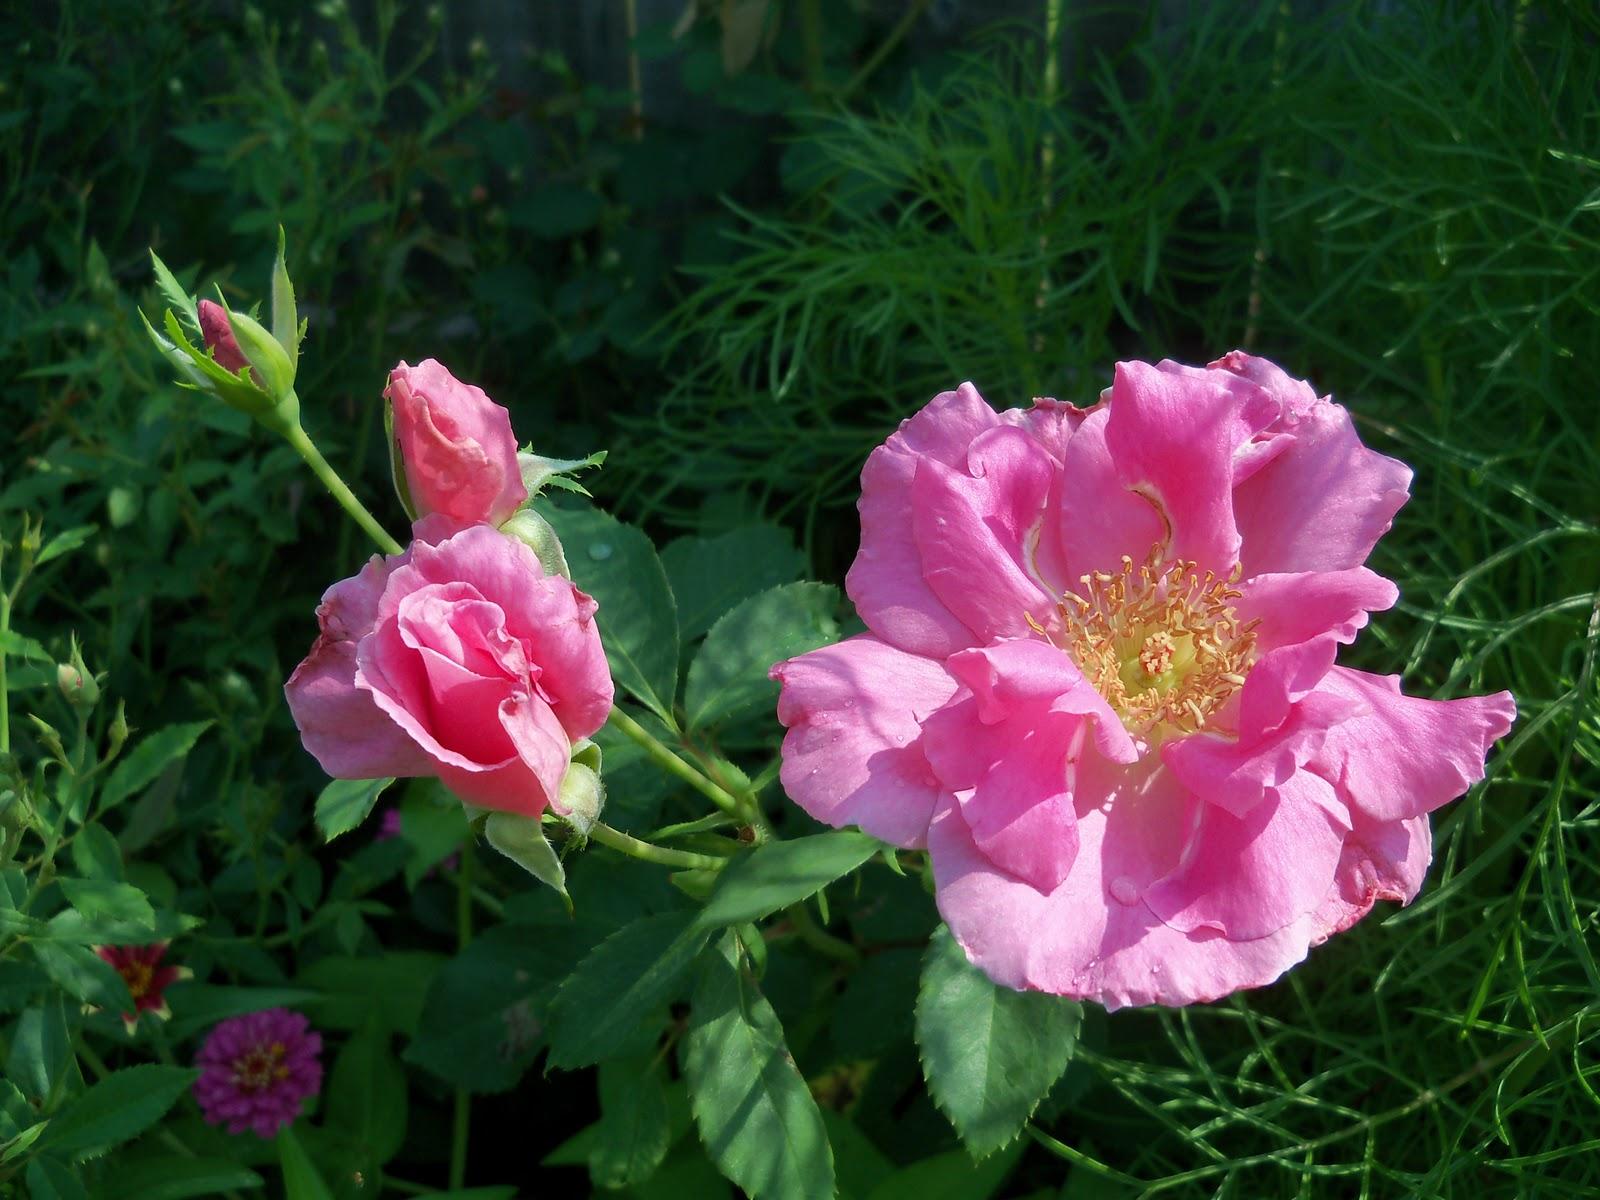 Gardening 2010, Part Two - 101_3283.JPG